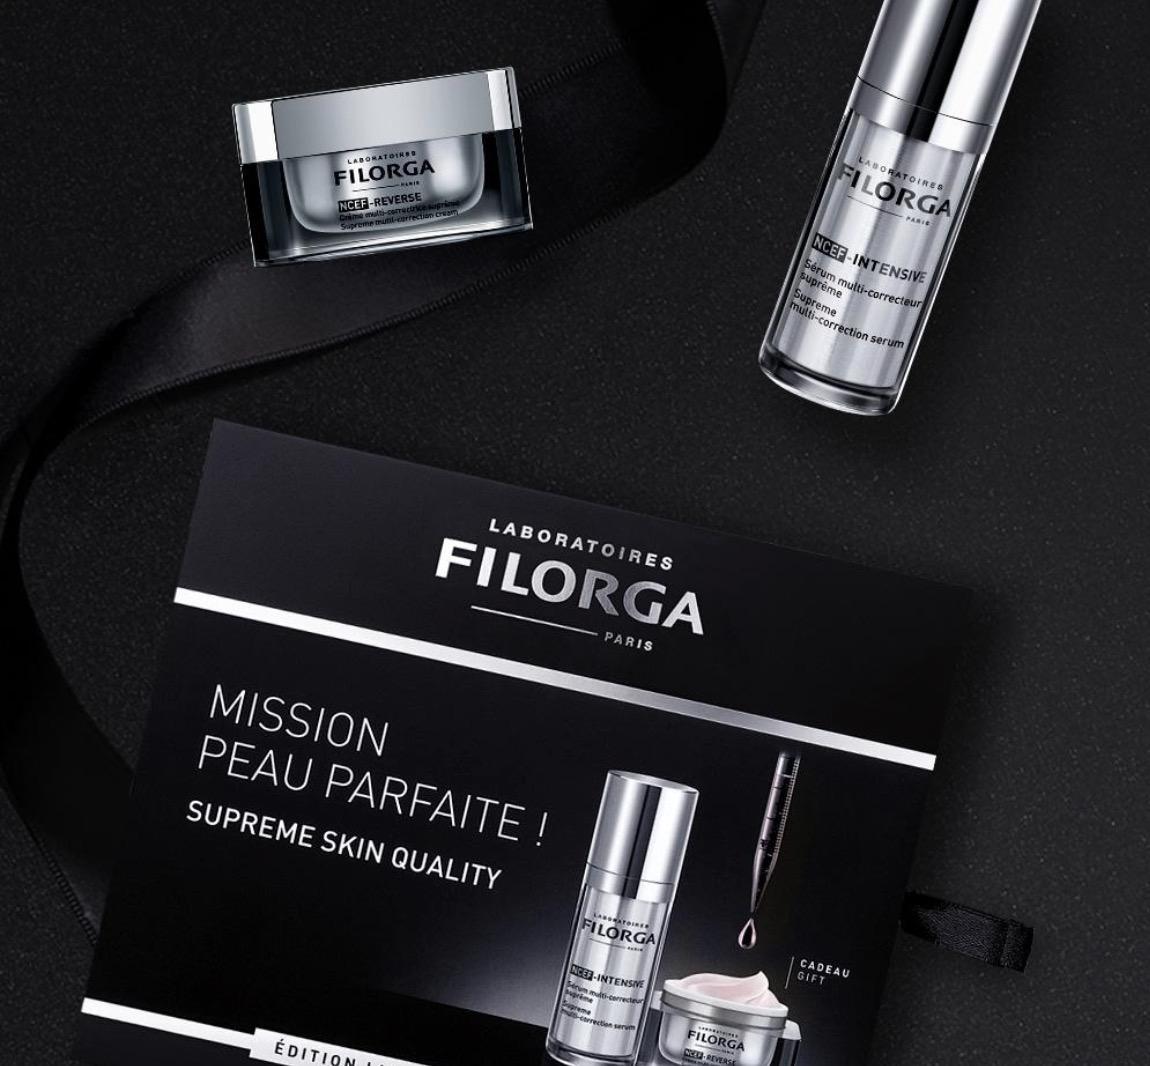 Code promo Le Figaro Madame : 25 coffrets de 2 produits de soins Filorga à gagner